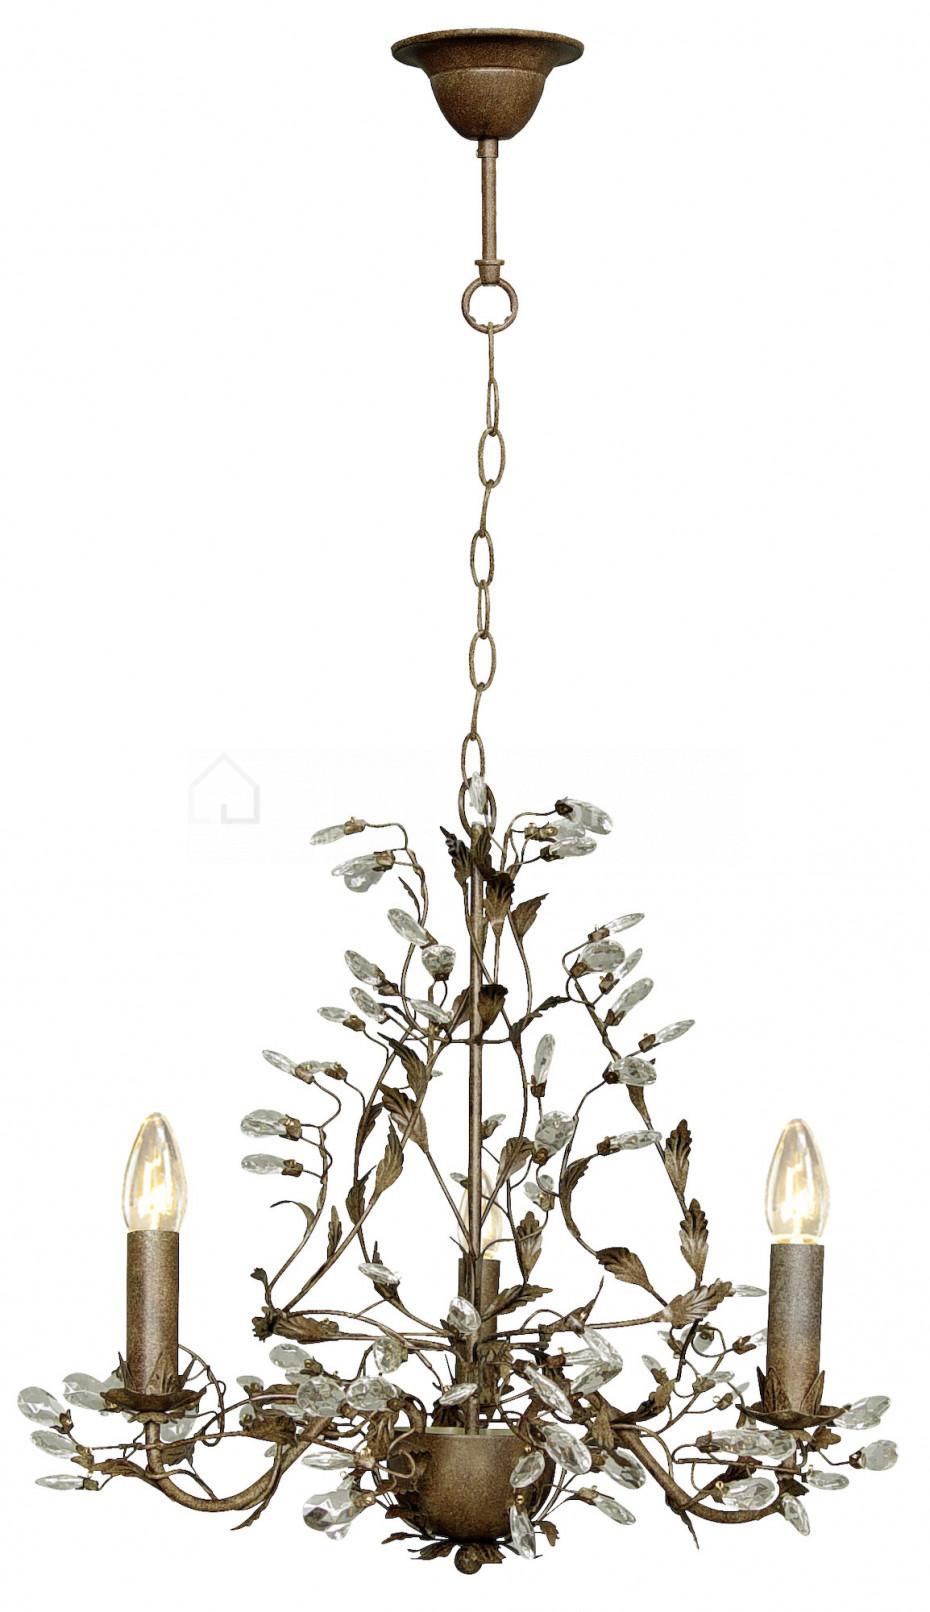 192cm-linea-verdace-roestkleur-3-lampen-x40w